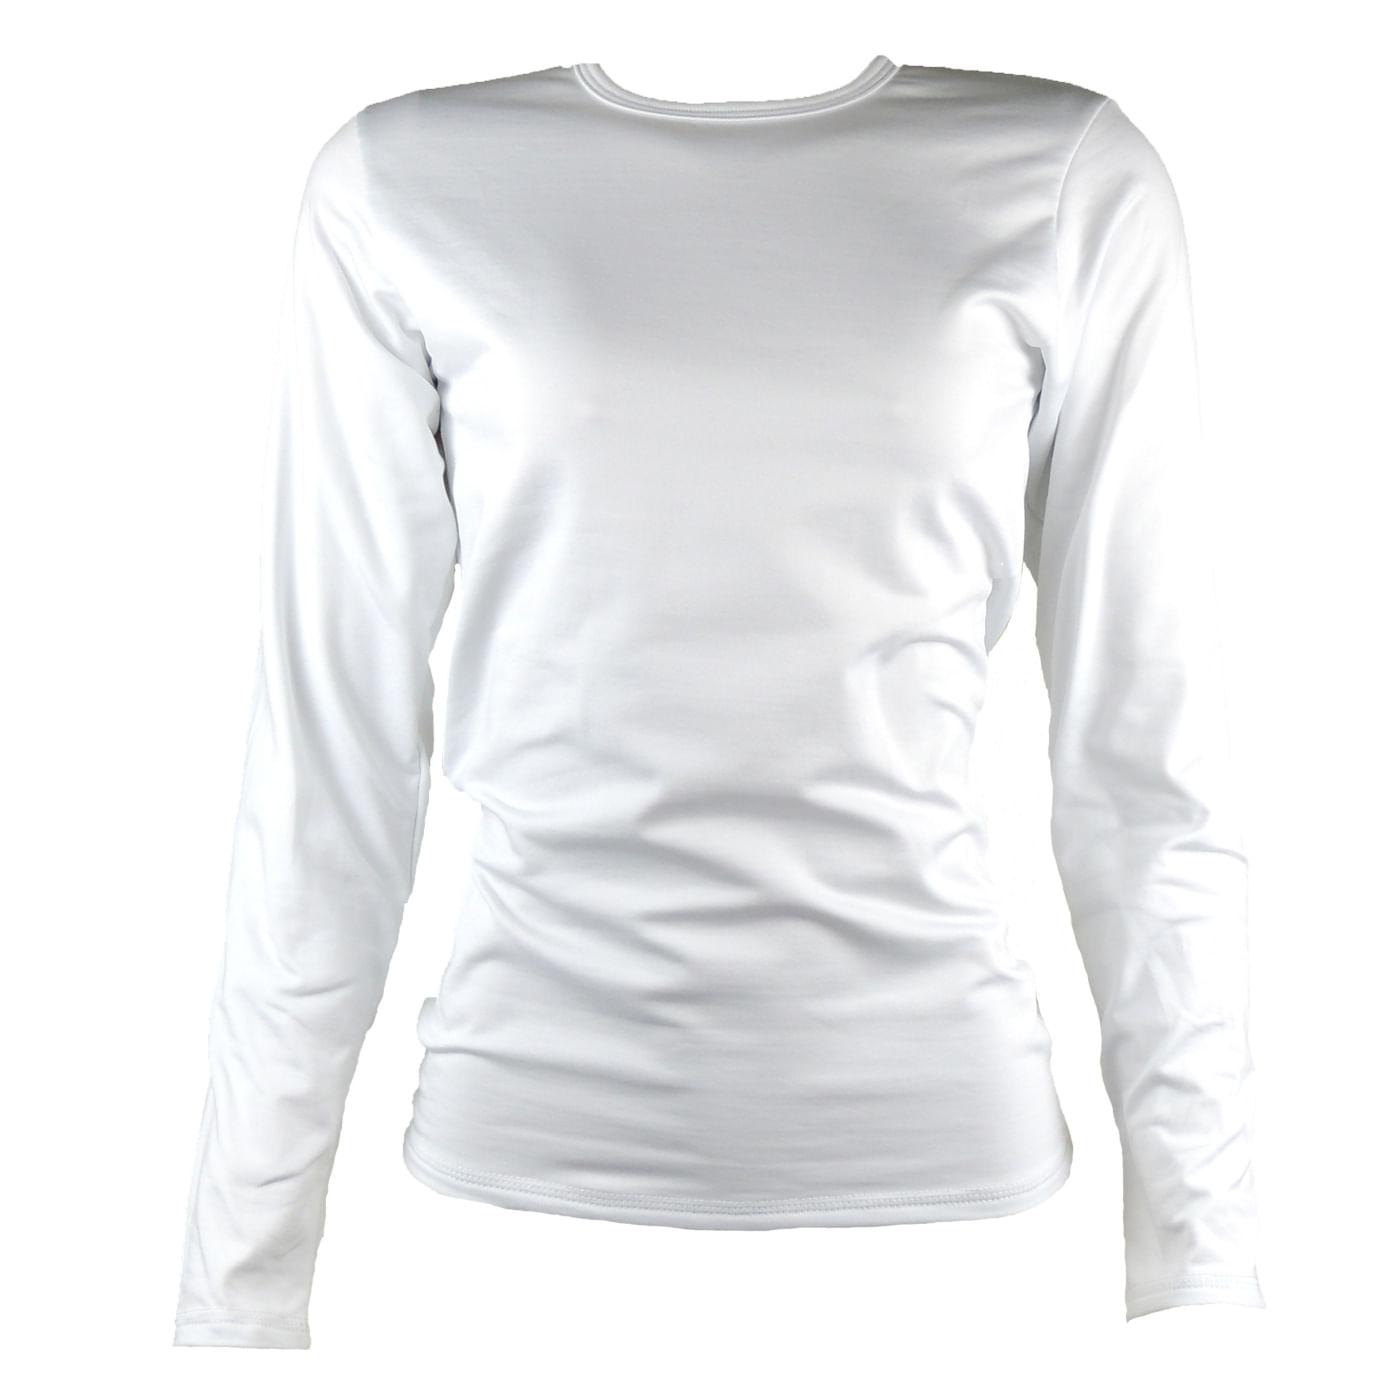 4fb7beeb9 Blusa térmica feminina segunda pele branca - fieroshop